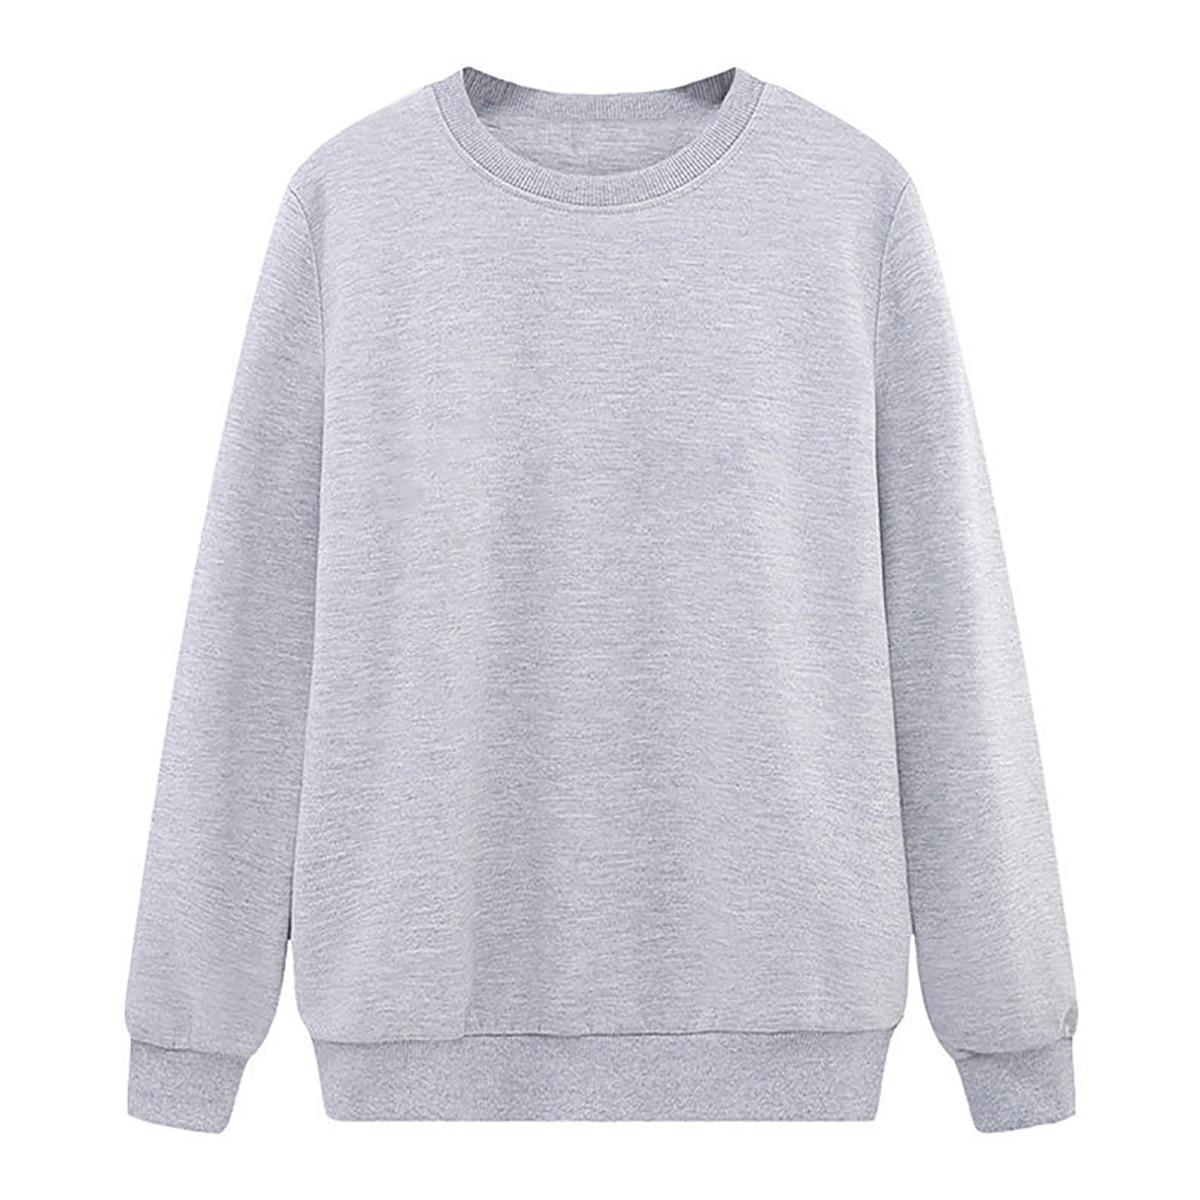 Solid Color Sweatshirt Women Casual Hoodie Fashion Winter Autumn Lasdies Pullover Fleece Black White Blue Red Gray Streetwear 9